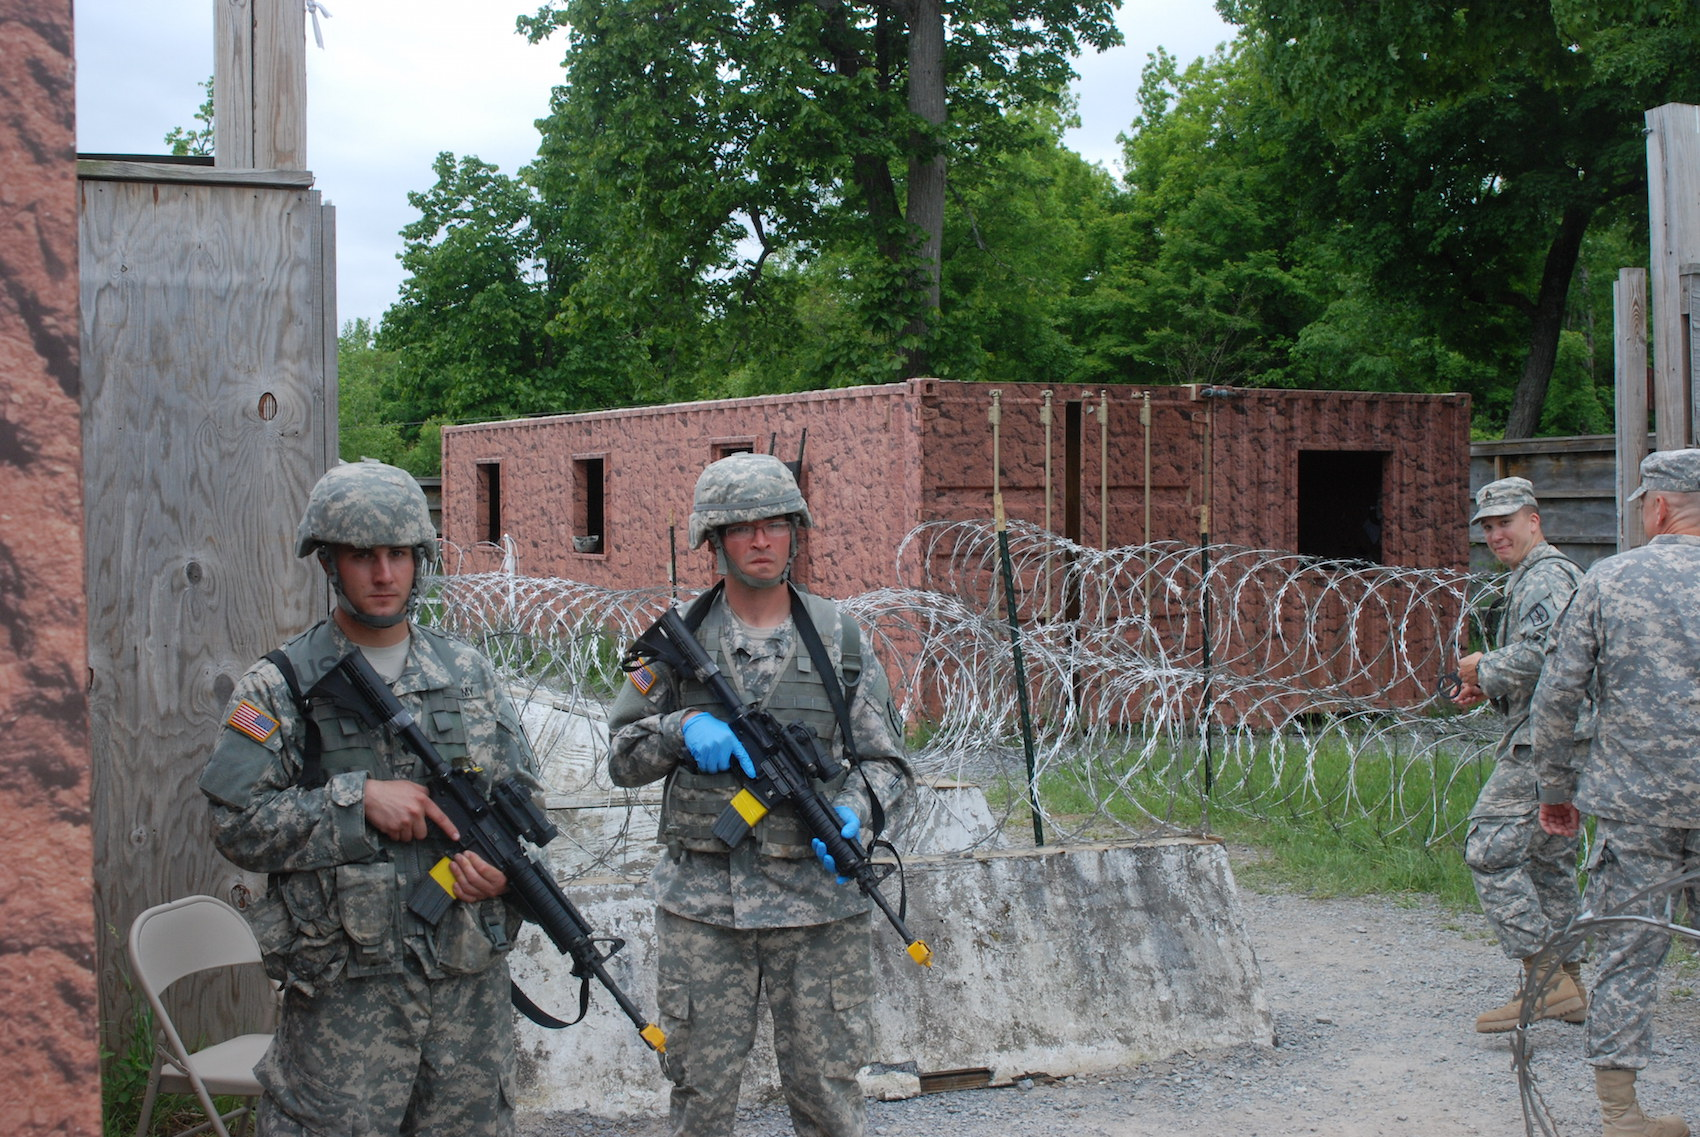 PHOTO CREDIT: U.S. ARMY NATIONAL GUARD PHOTO BY MAJOR AL PHILIPS